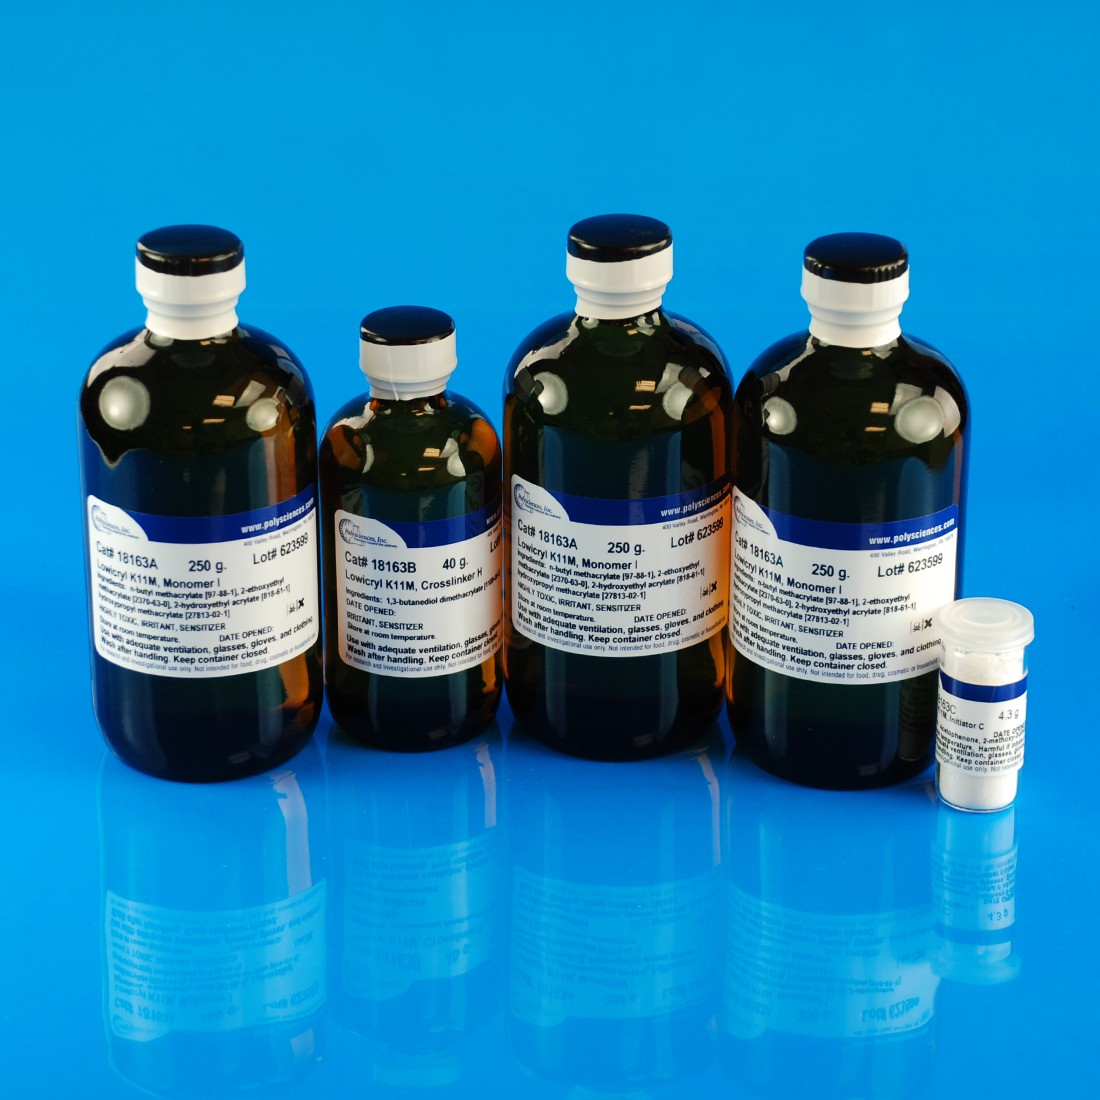 Lowicryl<sup>®</sup> K11M Polar, Hydrophilic, -60ºC embedding kit